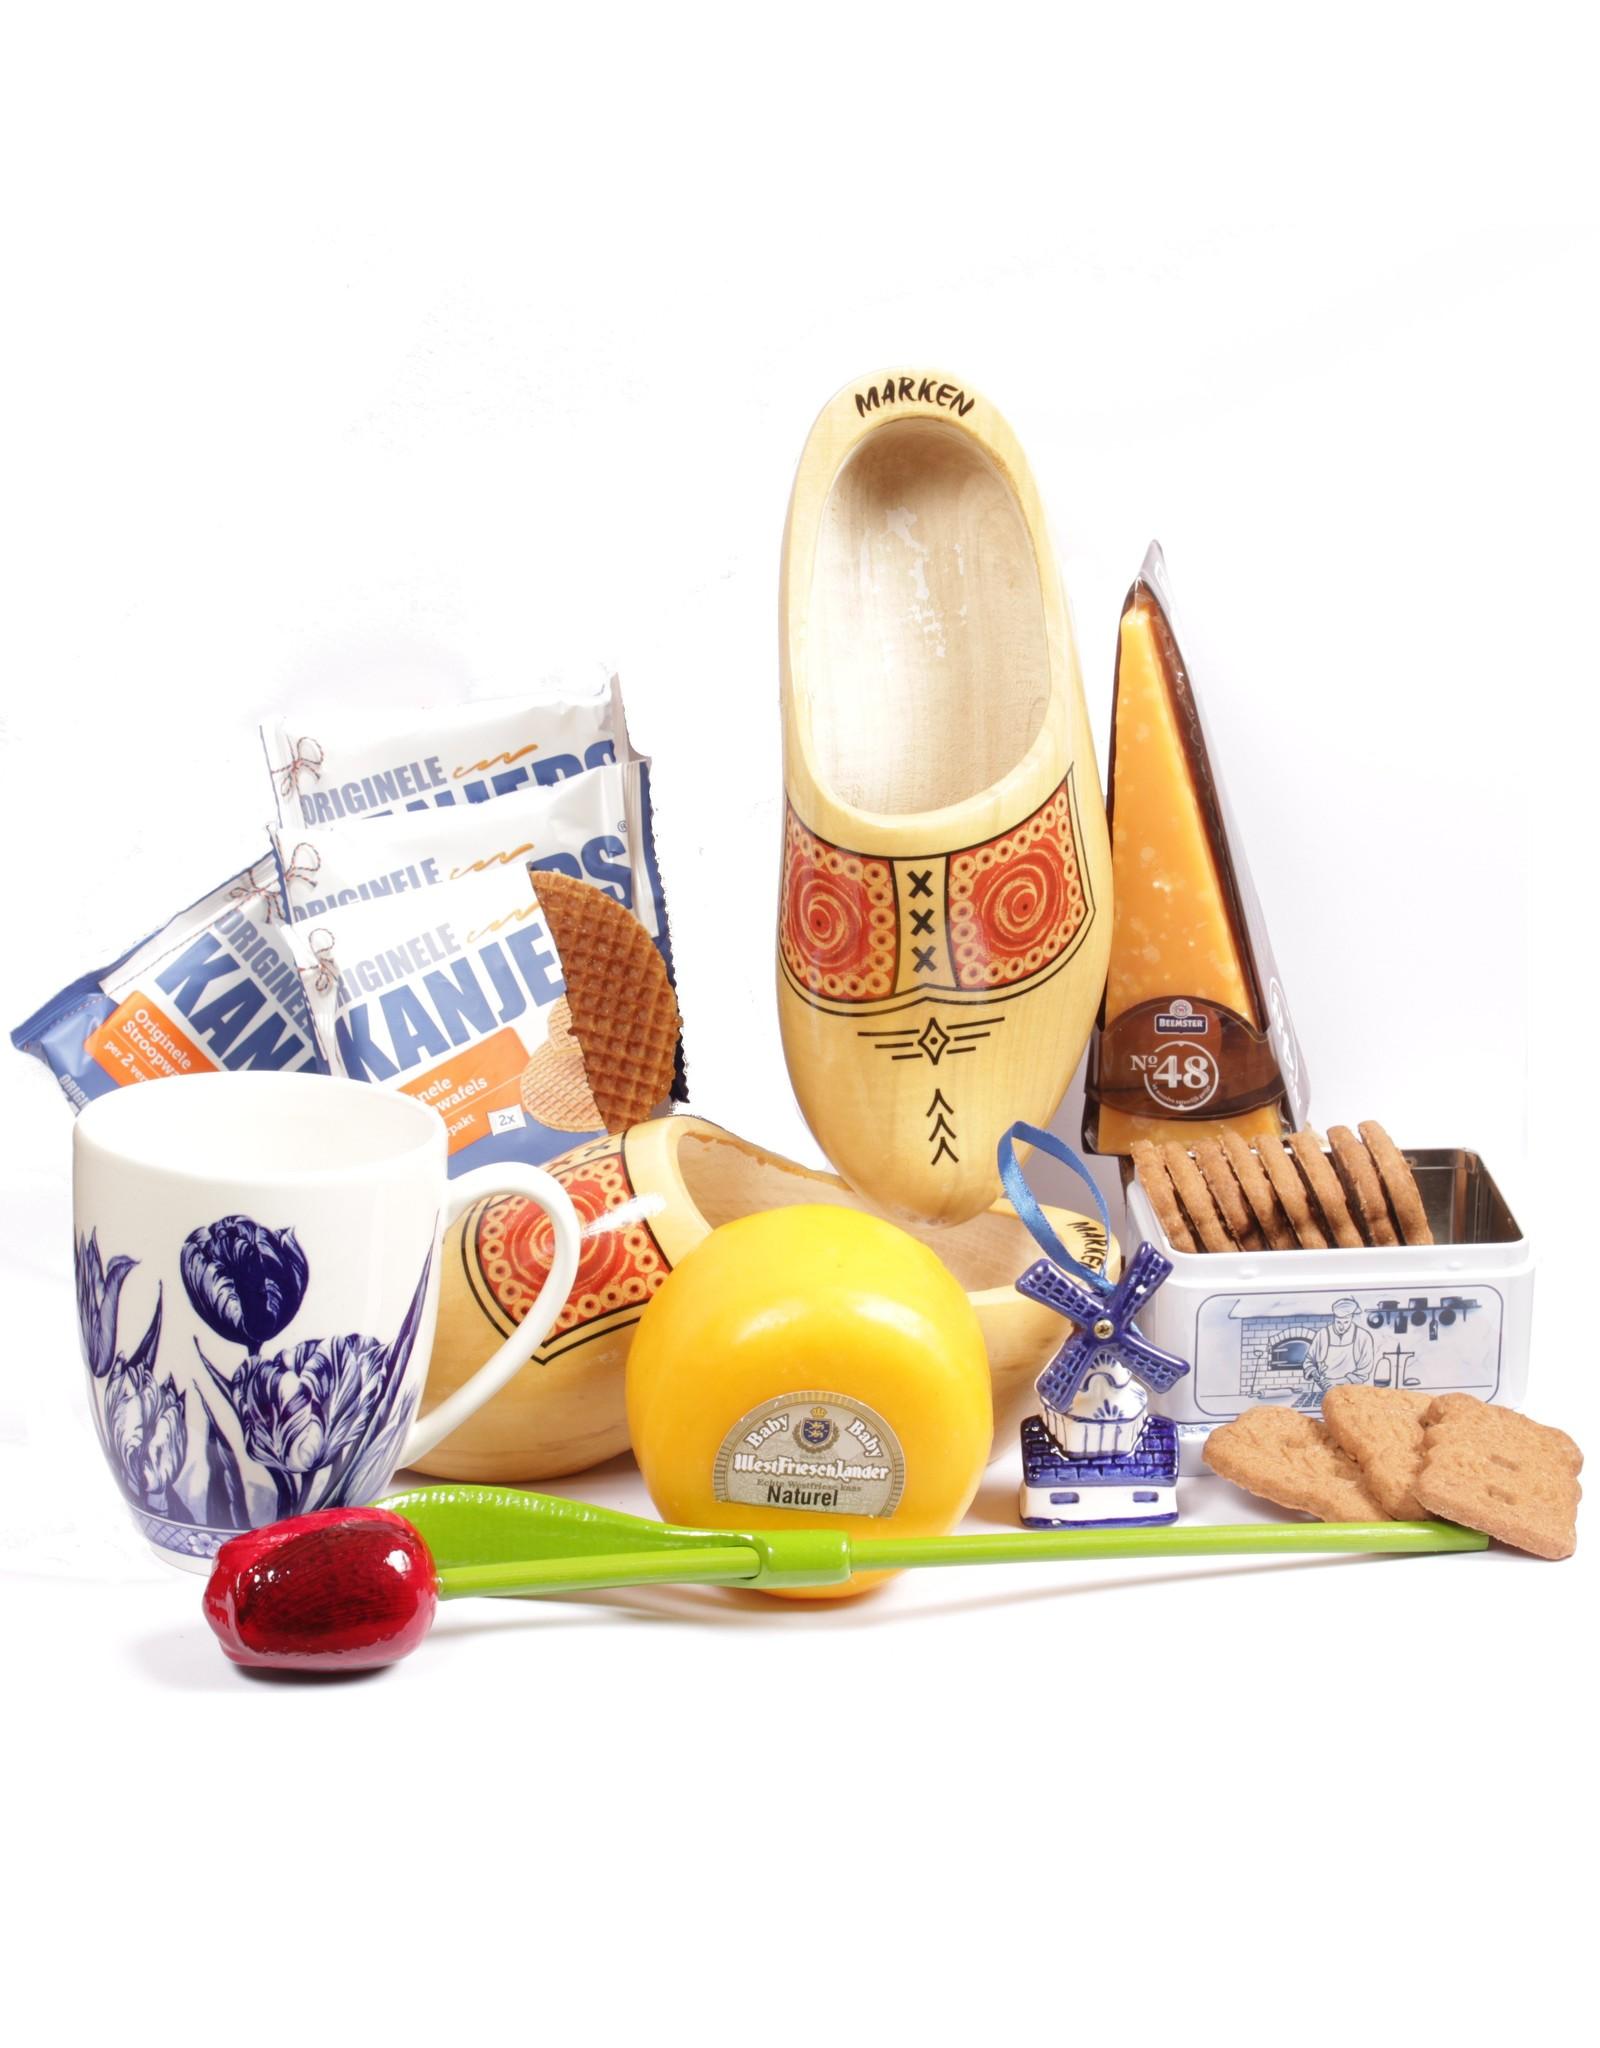 Dutch Giftbox, Netherlands Gift Box